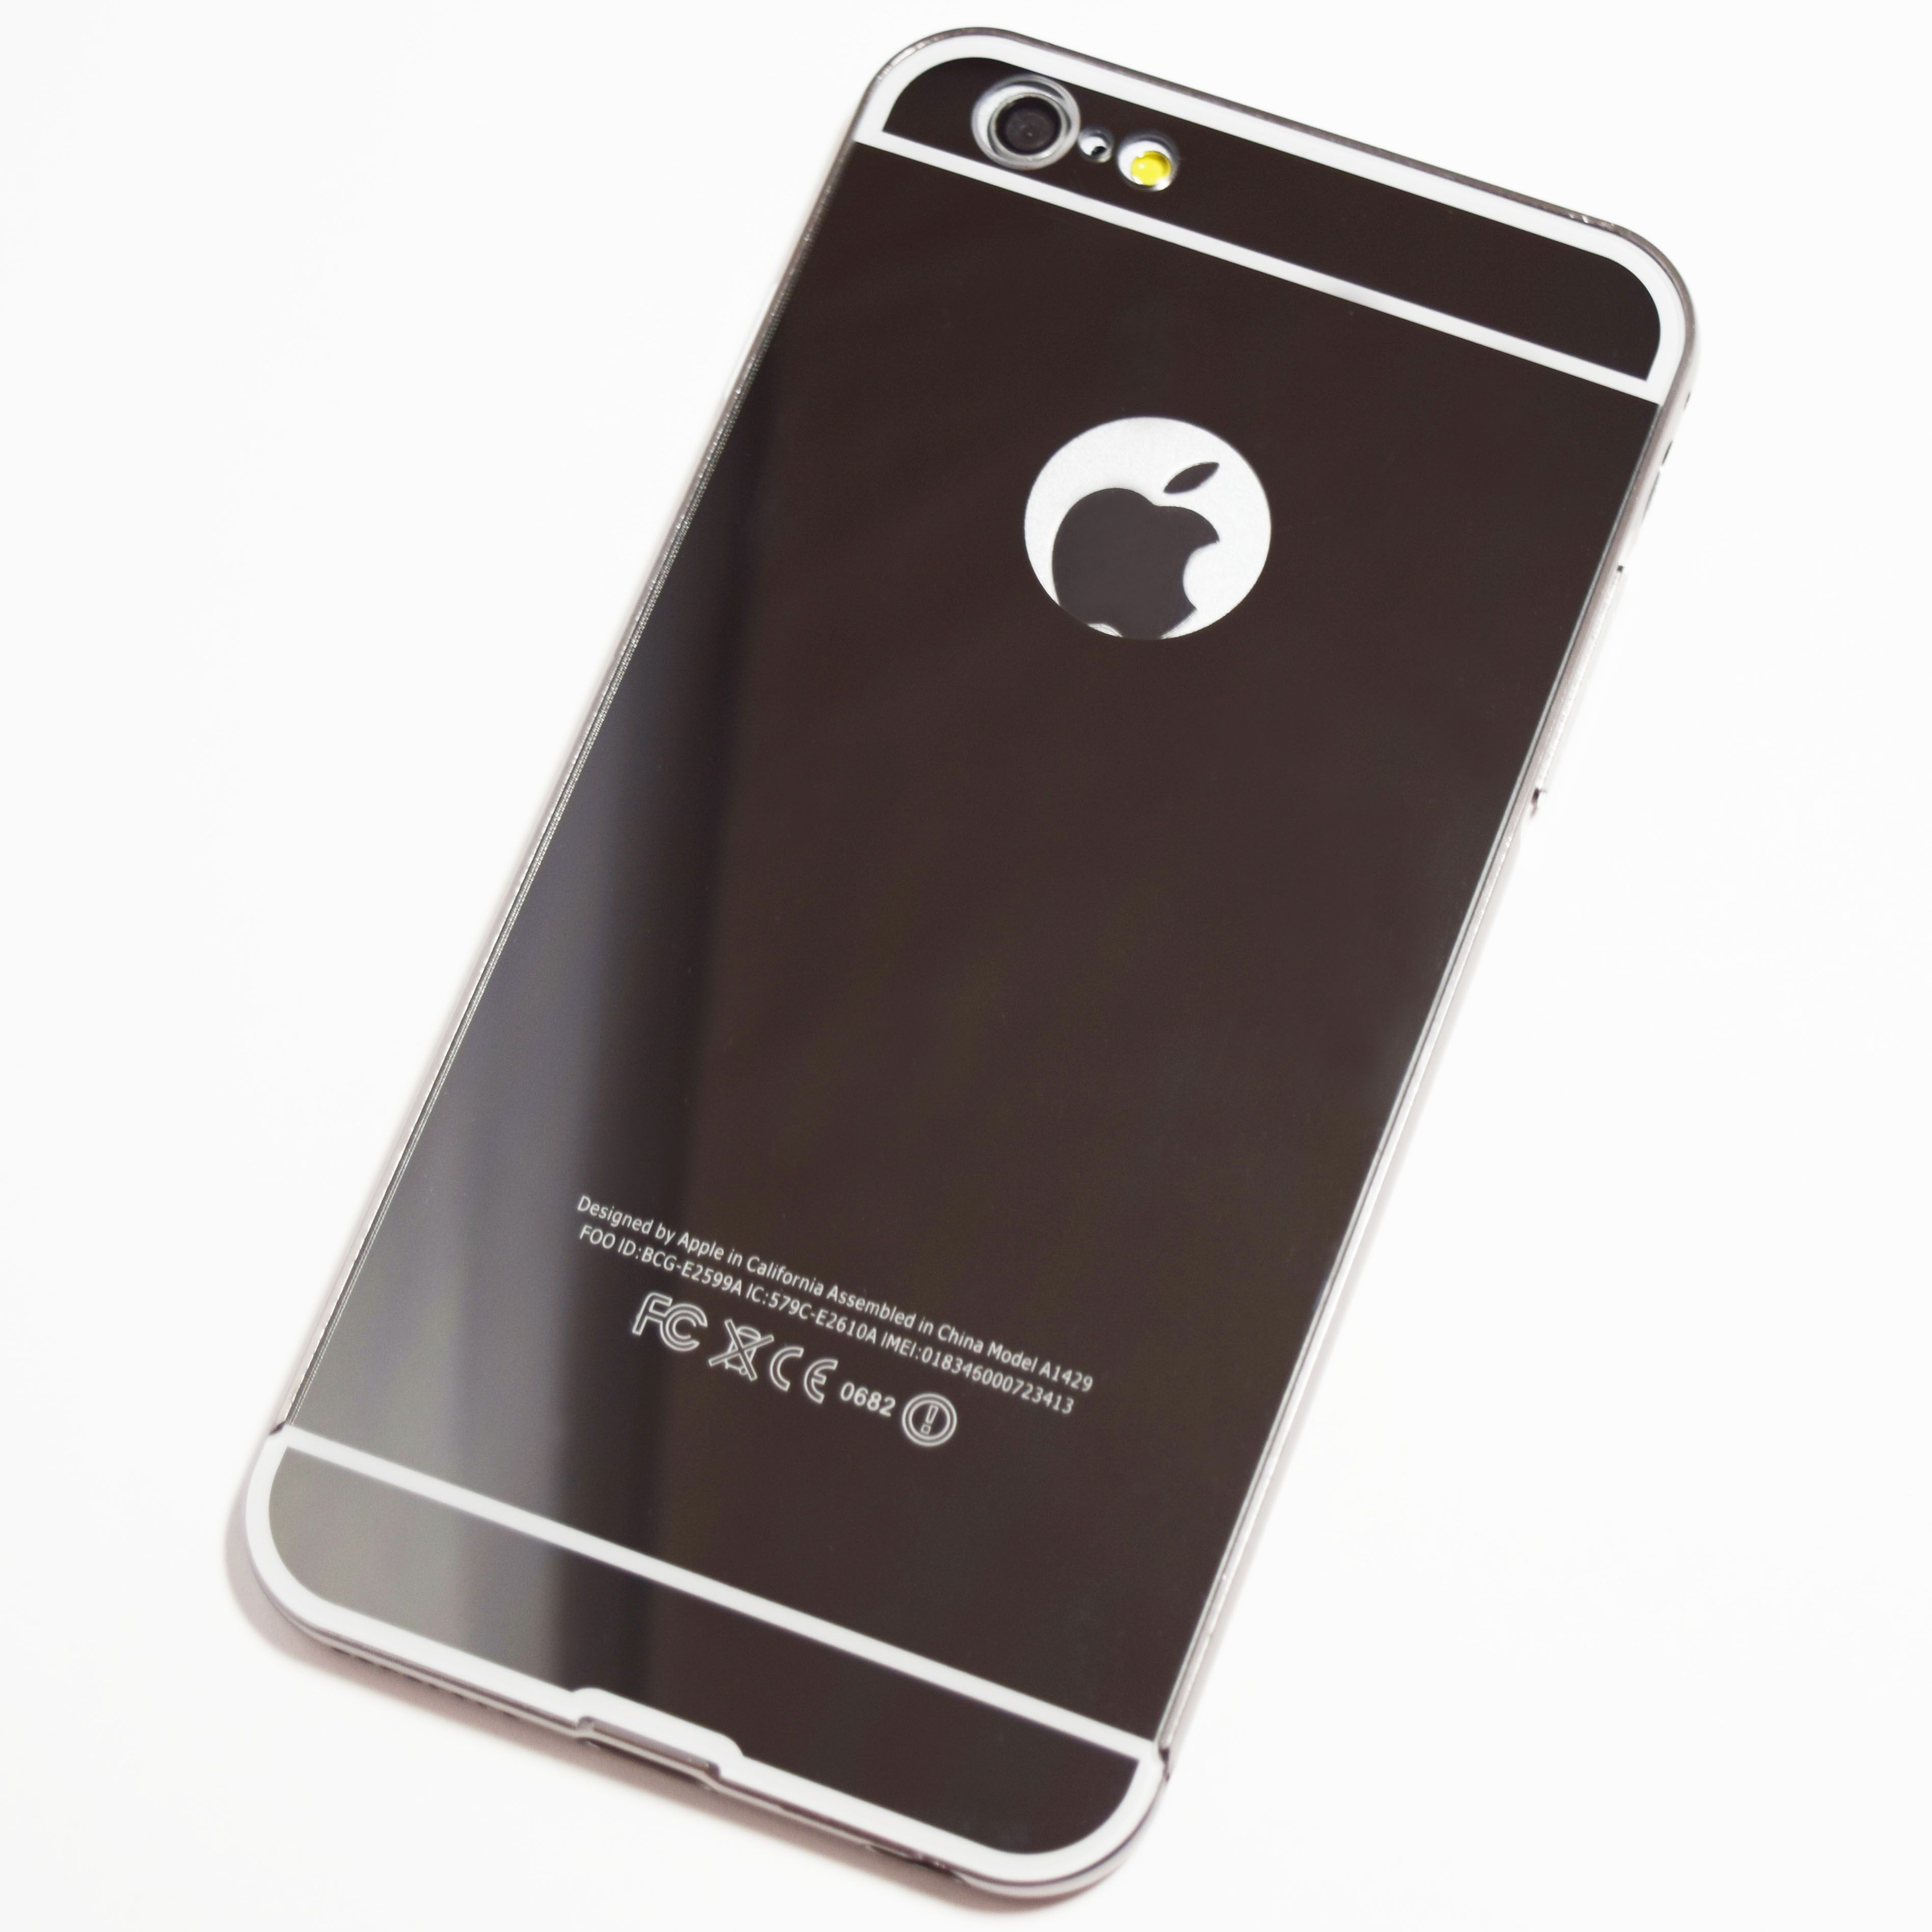 iphone 0682. space grey iphone 6 plus / 6s mirror case iphone 0682